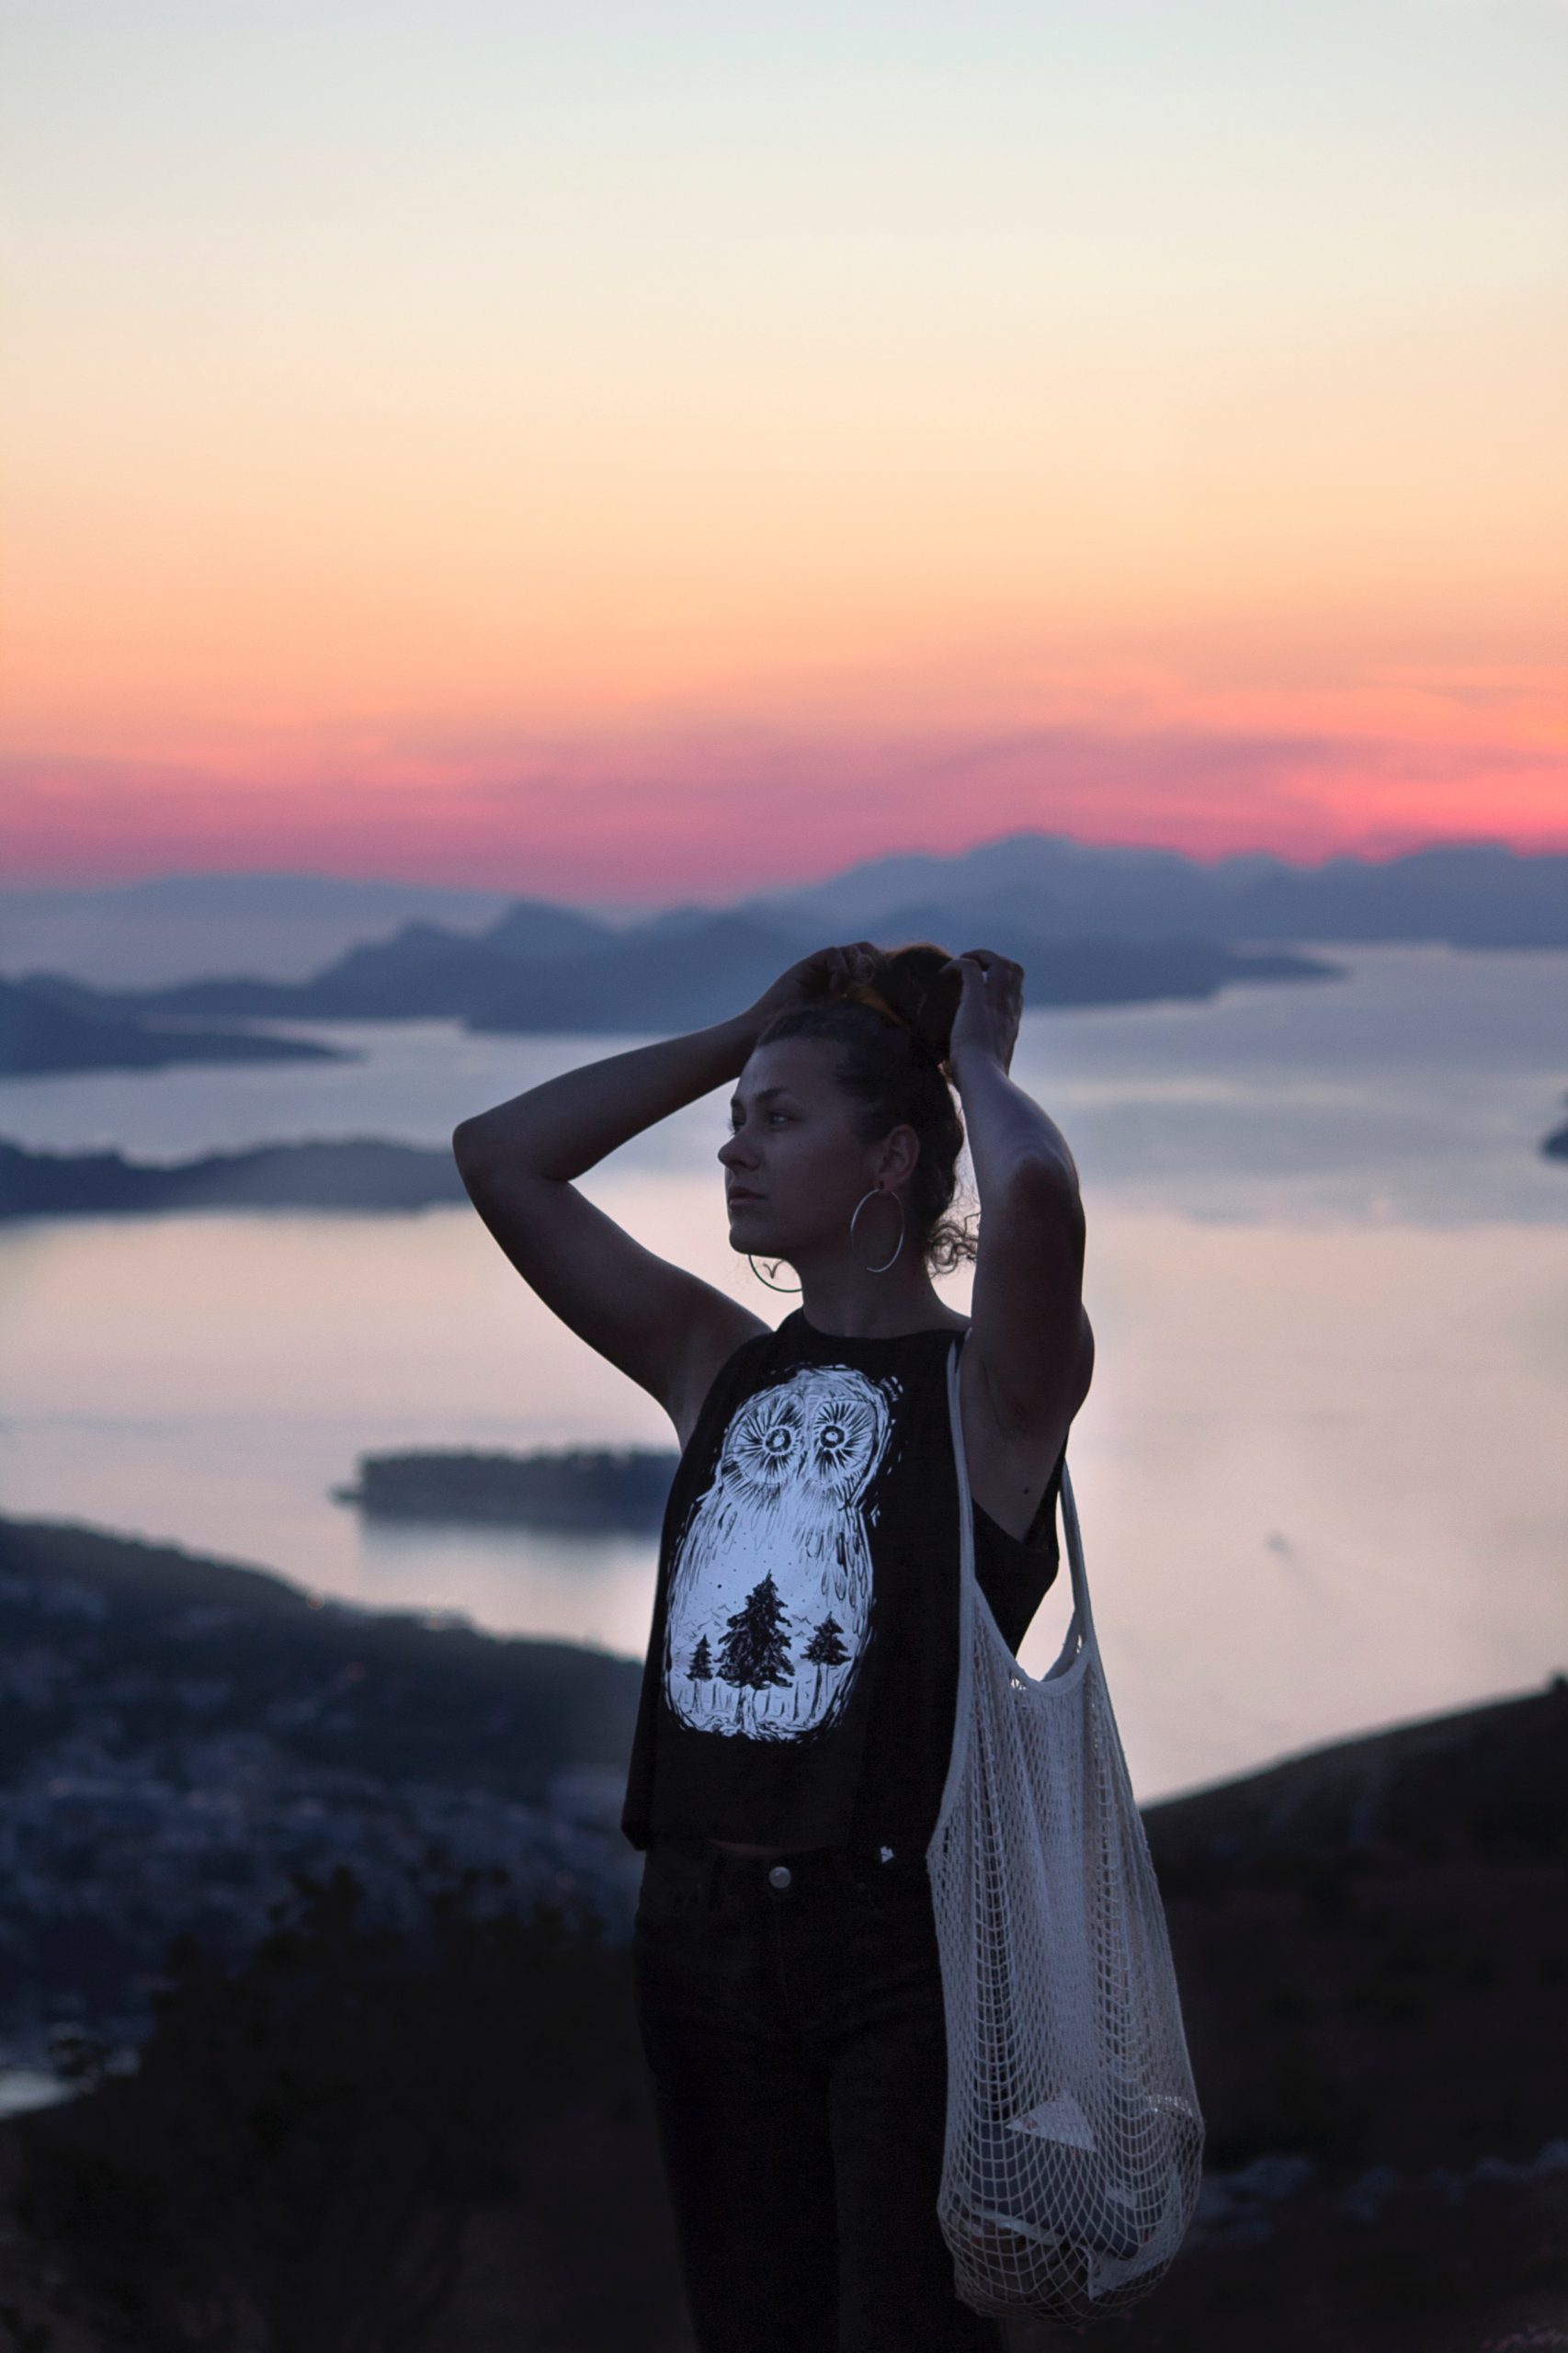 Západ slnka na hore Srd - Dubrovník